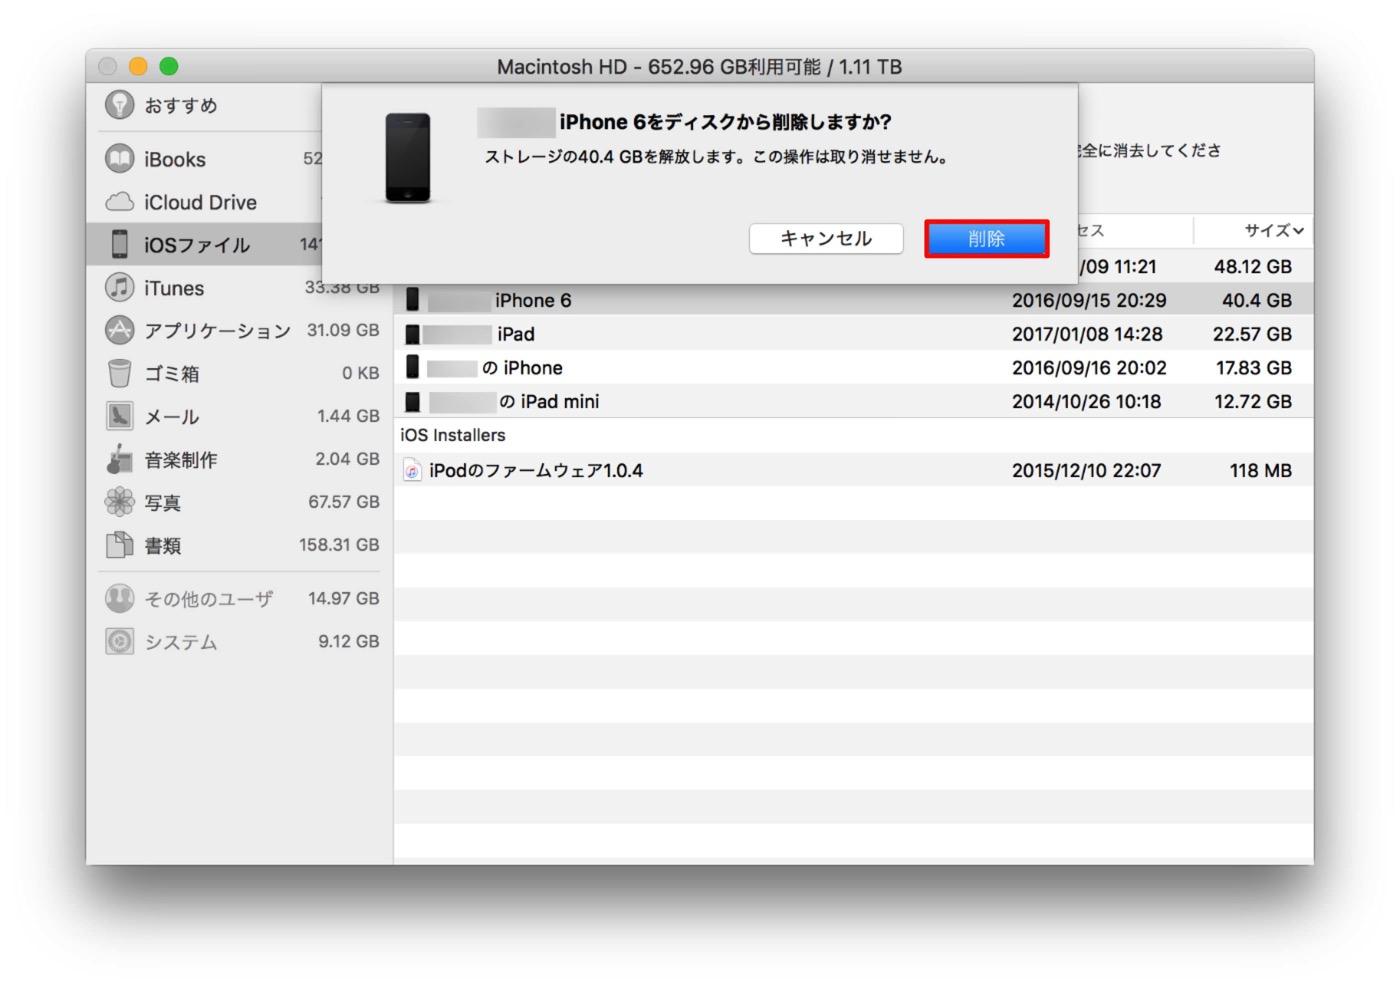 iMac 5K Retinaディスプレイモデル 管理画面-8